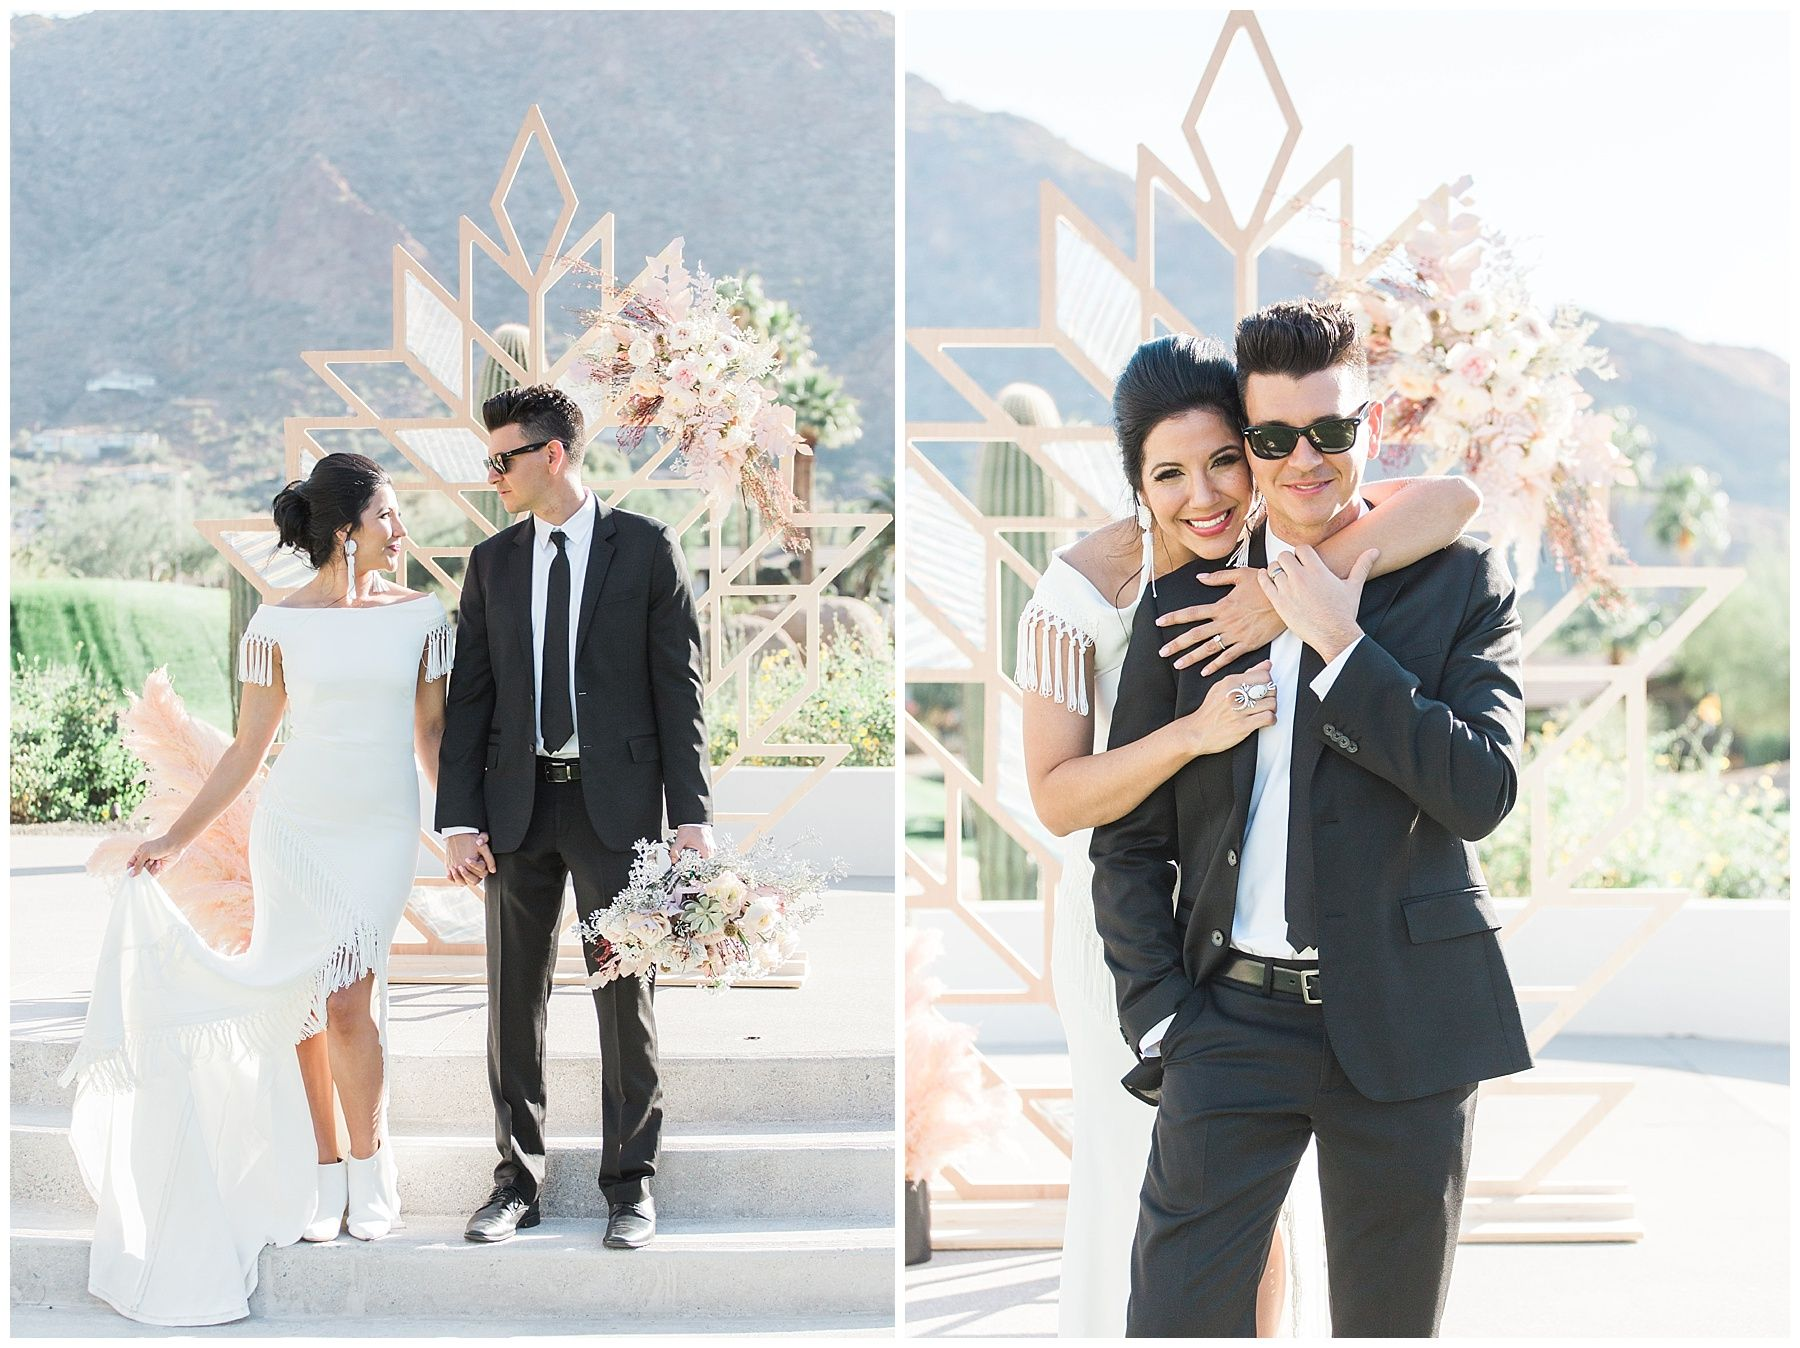 Rock and Roll Themed Arizona Wedding! And a fringe wedding dress ...